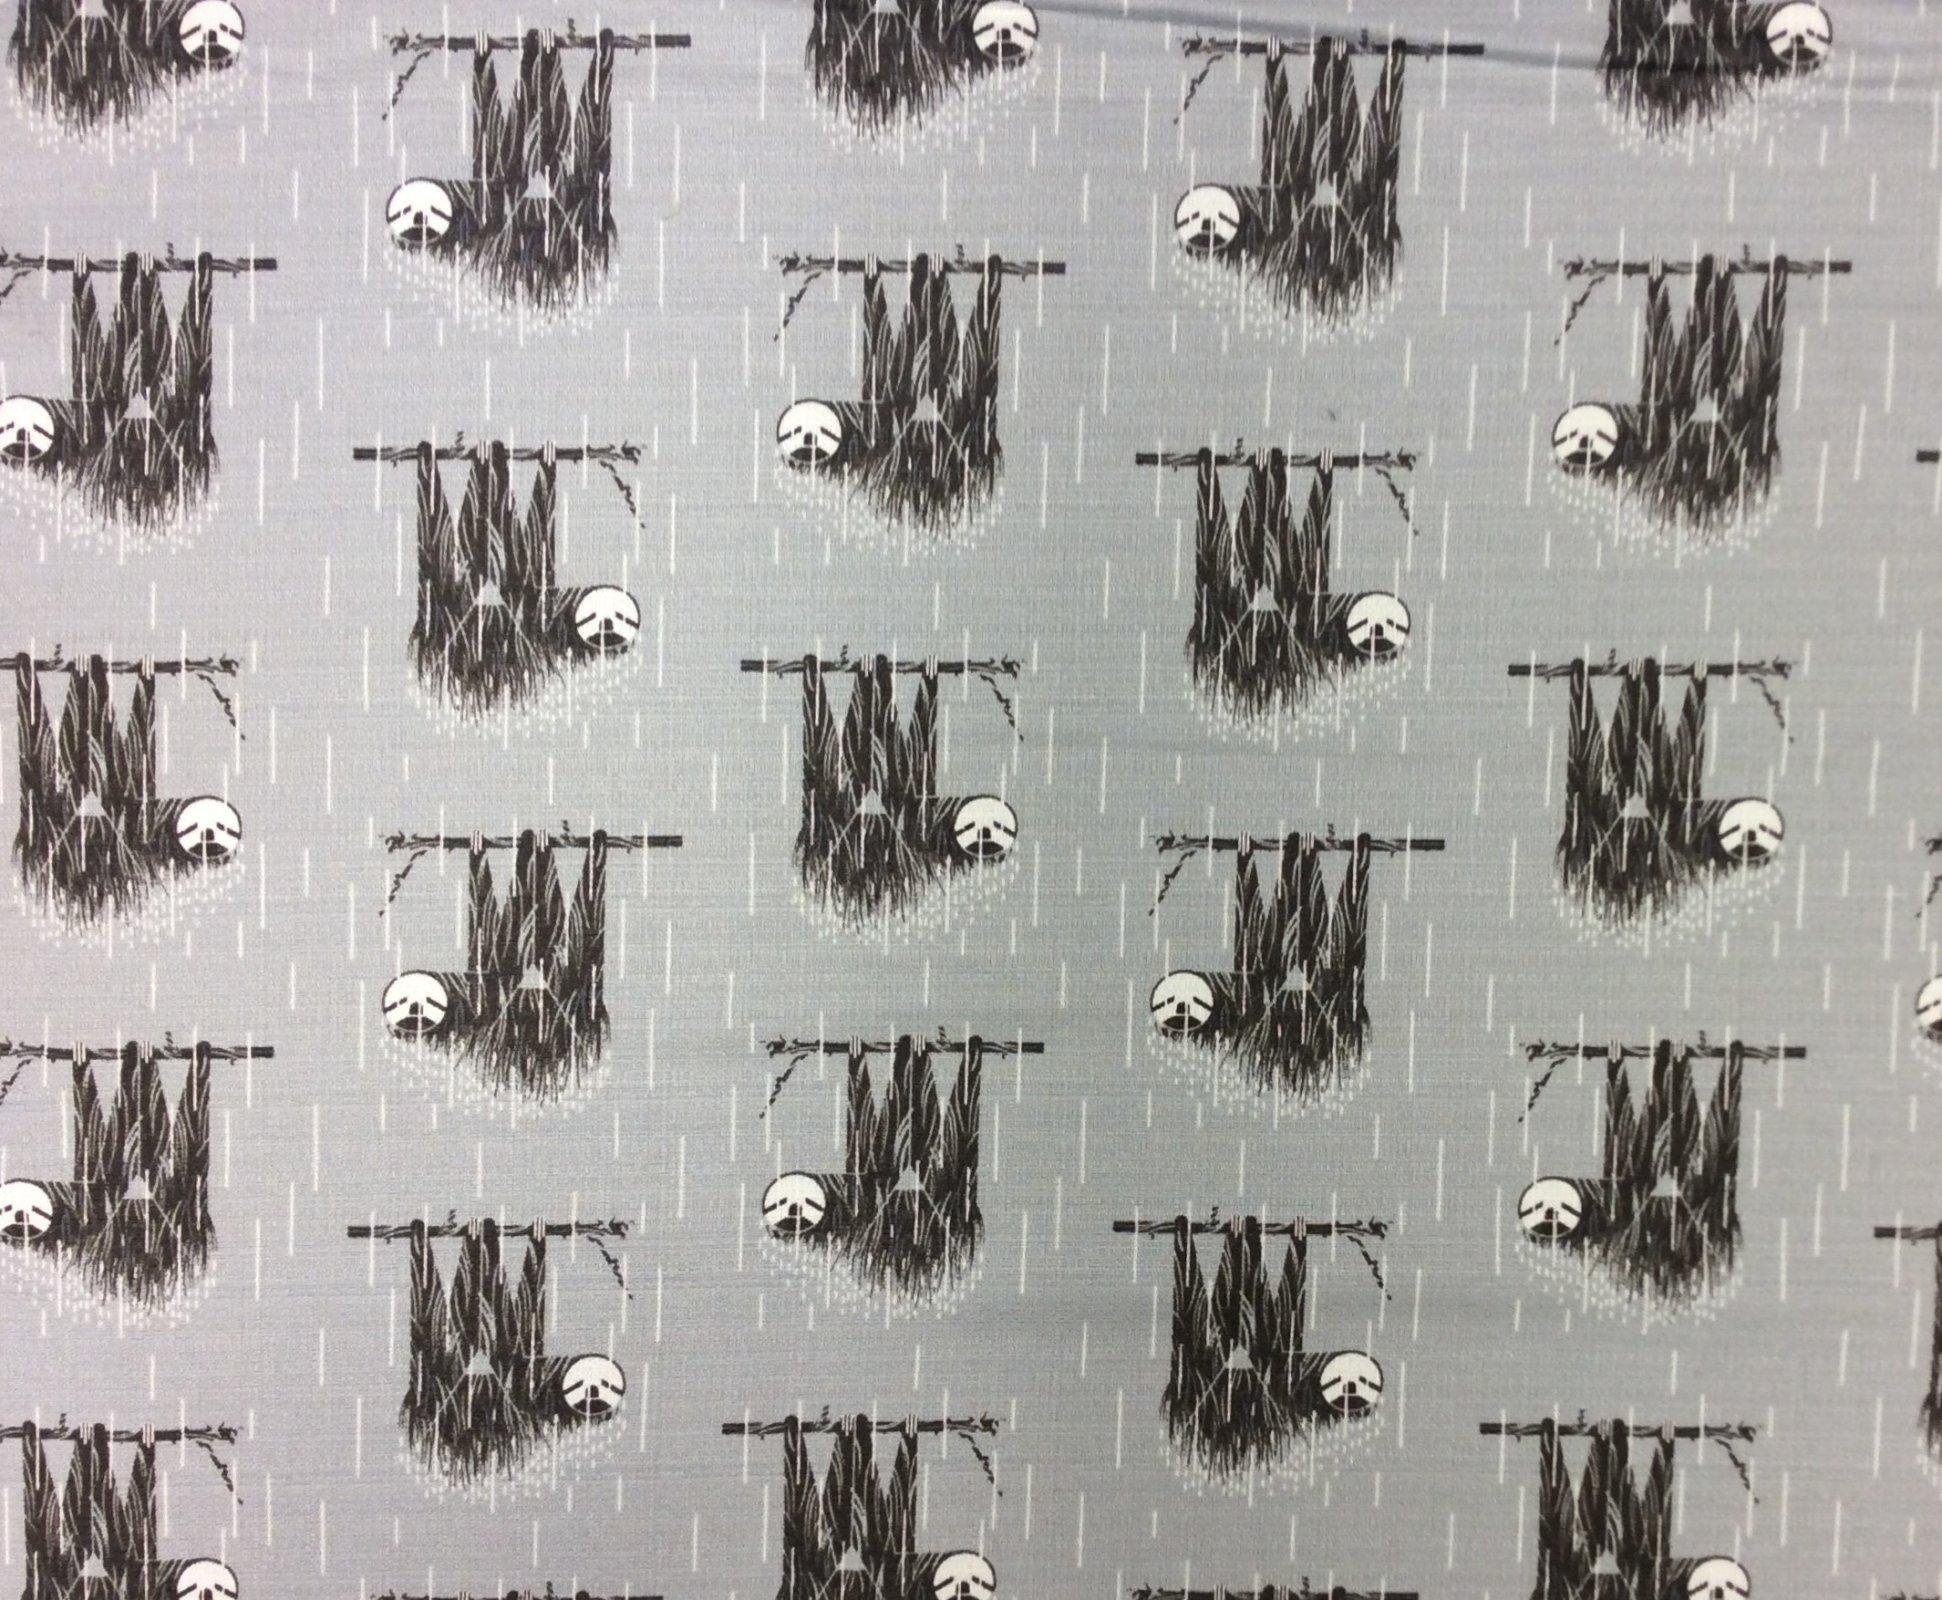 Charley Harper Barkcloth Sloth Wide Organic Cotton Mid Century Cotton Home Dec Fabric CHB112